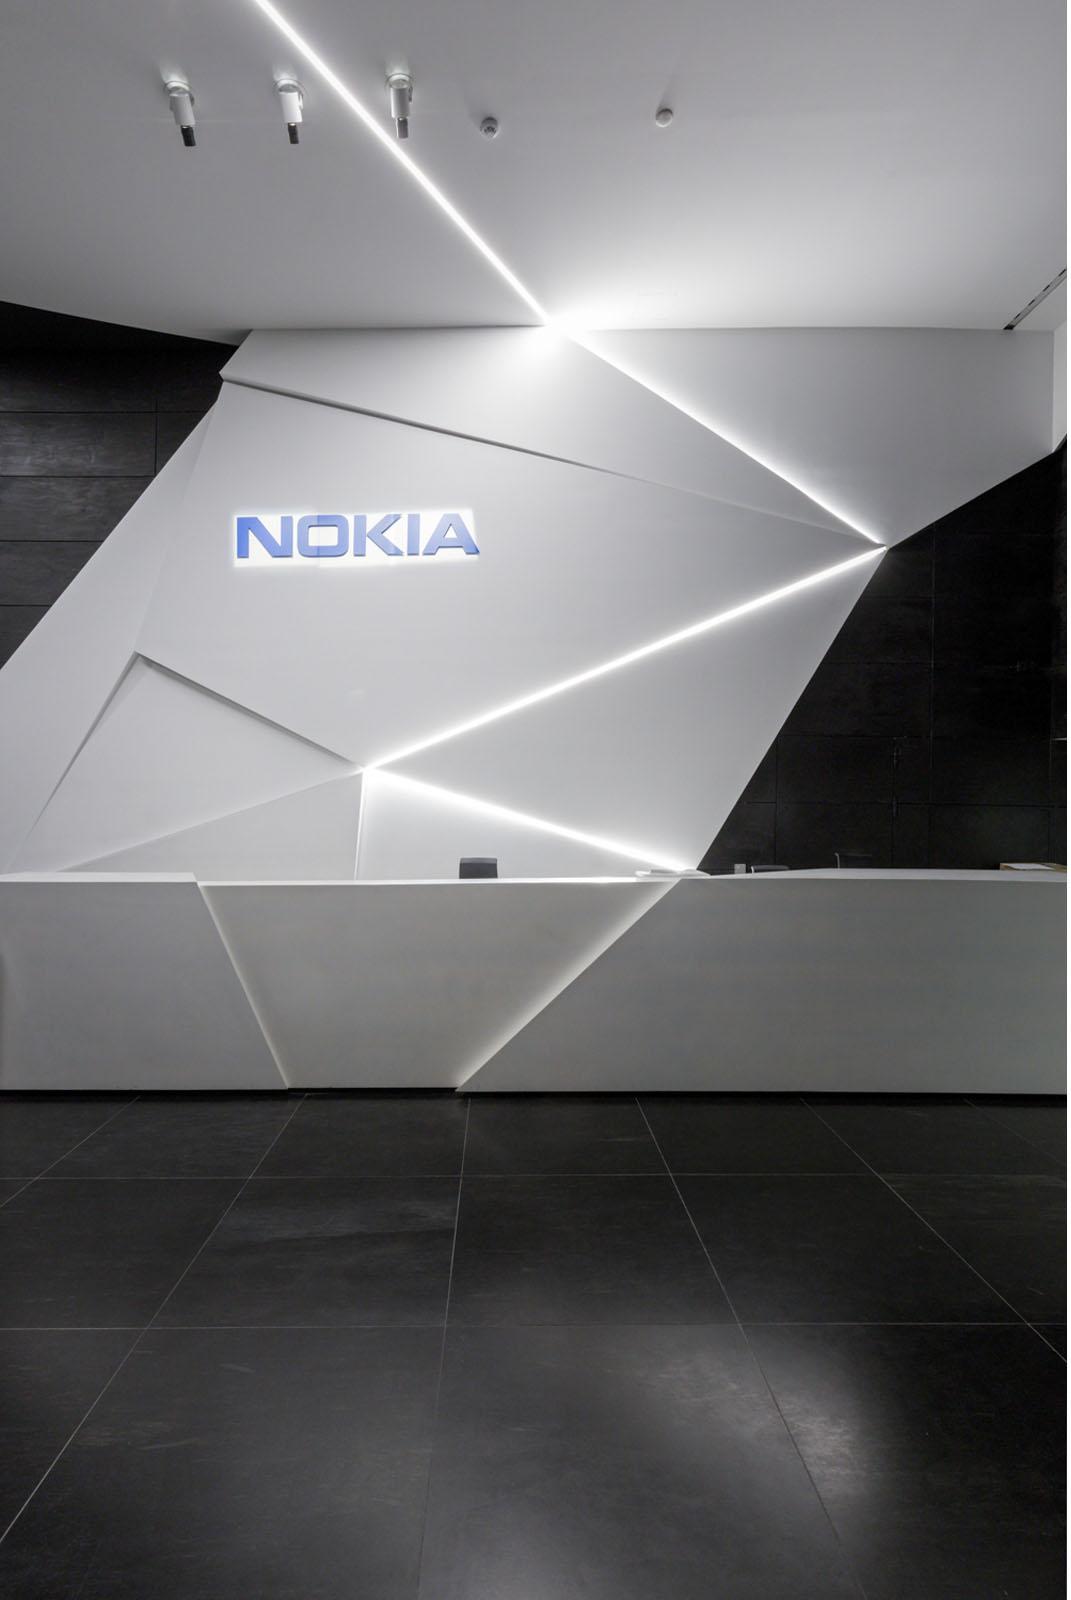 Nokia_20171111_0170_copy_LR.jpg